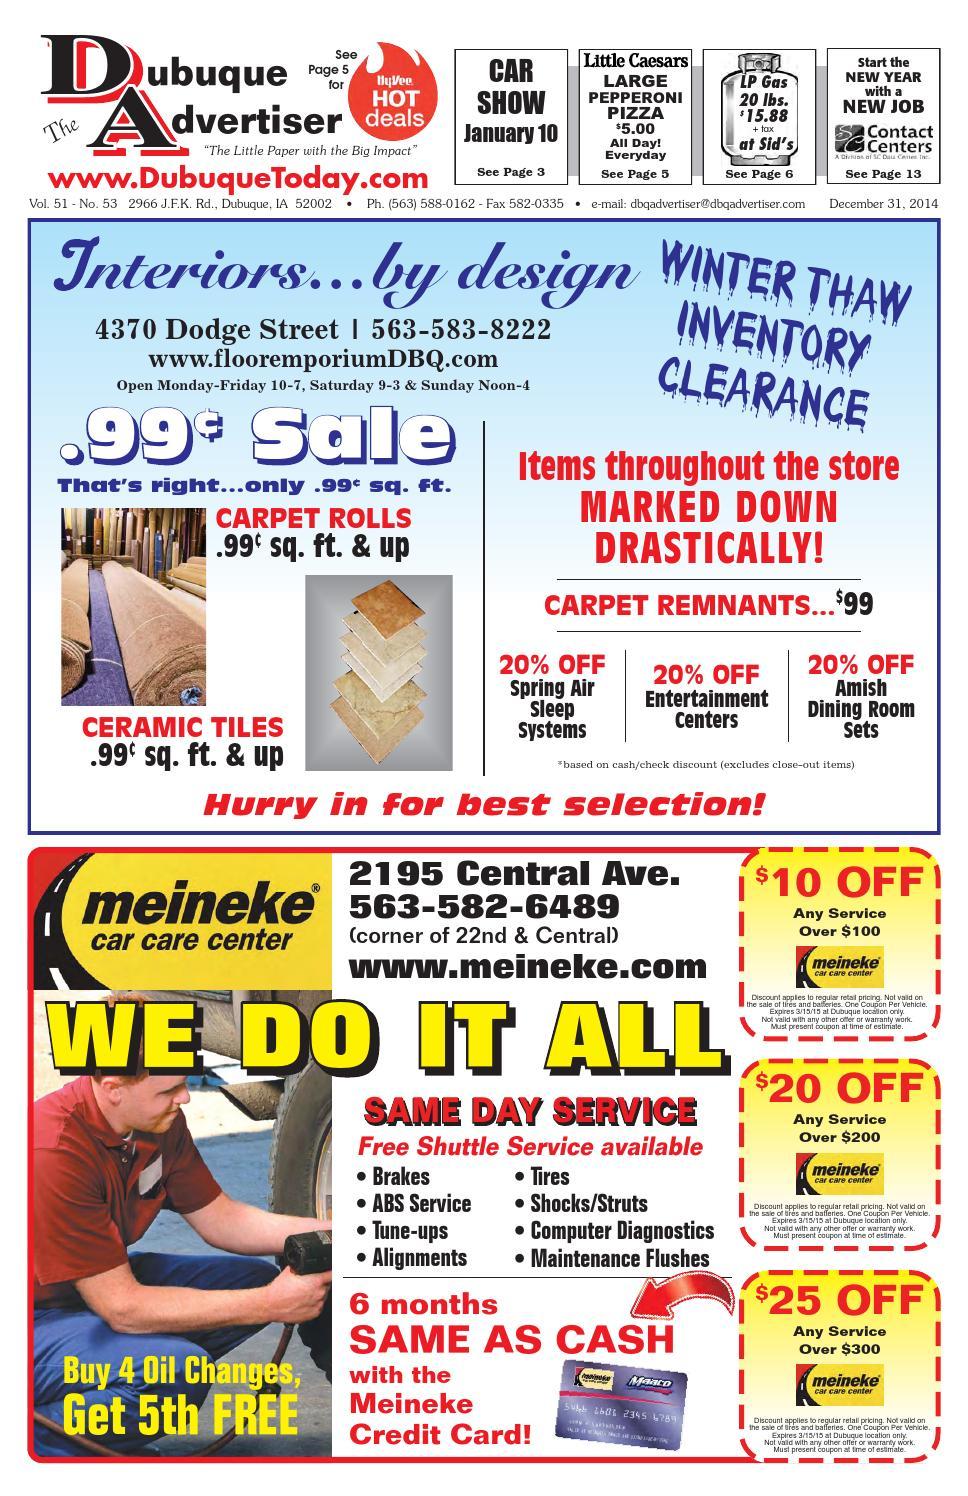 a4160184db7 The Dubuque Advertiser December 31